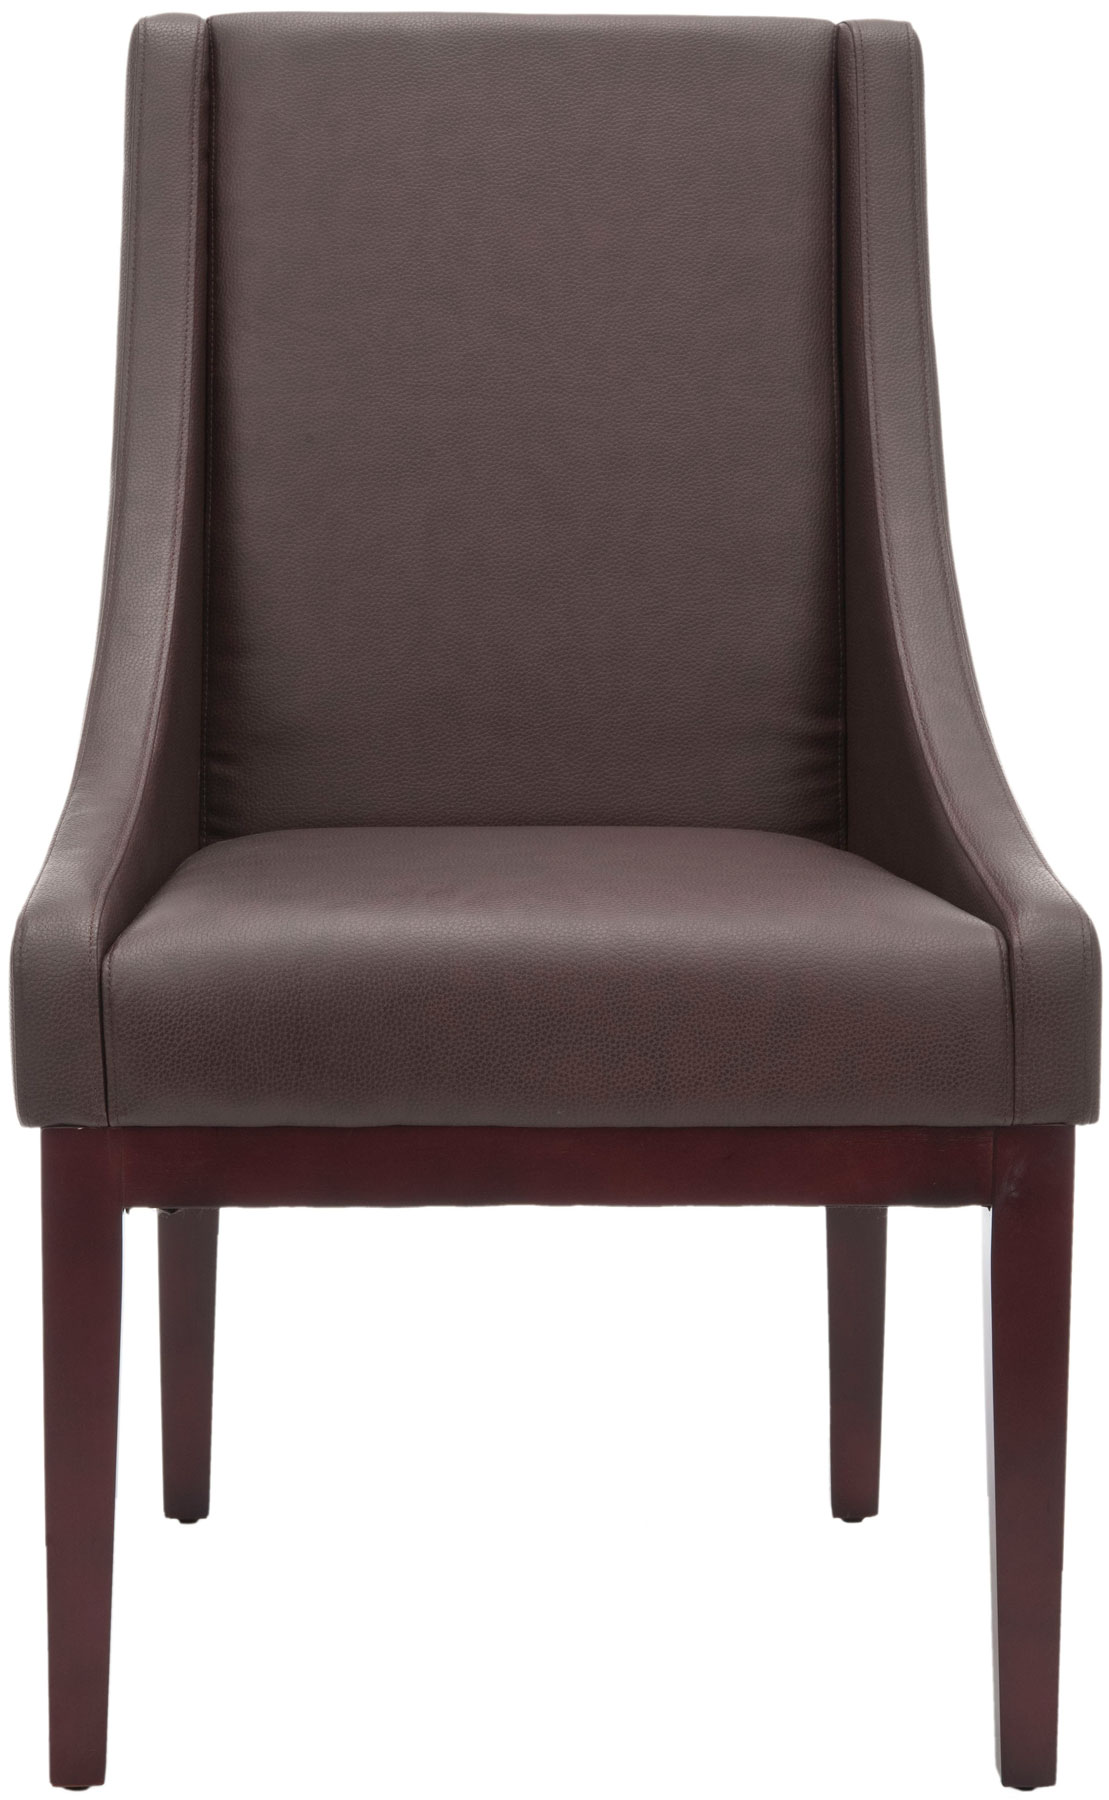 MCR4500C Dining Chairs - Furniture by Safavieh  Safavieh